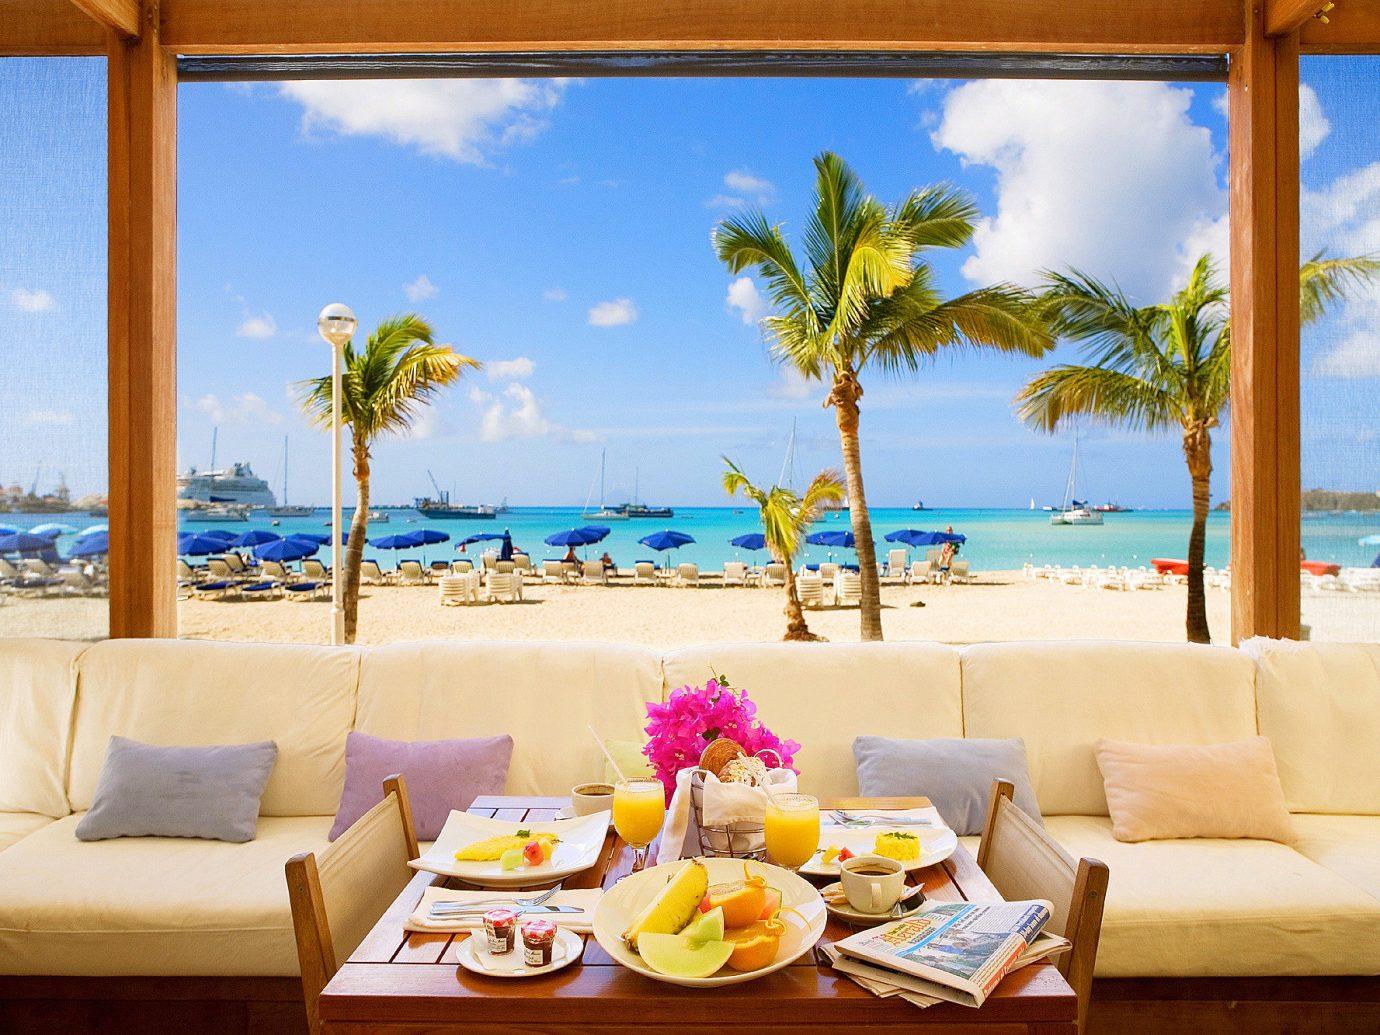 Hotels table window leisure vacation indoor caribbean Living Resort Beach estate Ocean home Sea swimming pool Villa furniture decorated